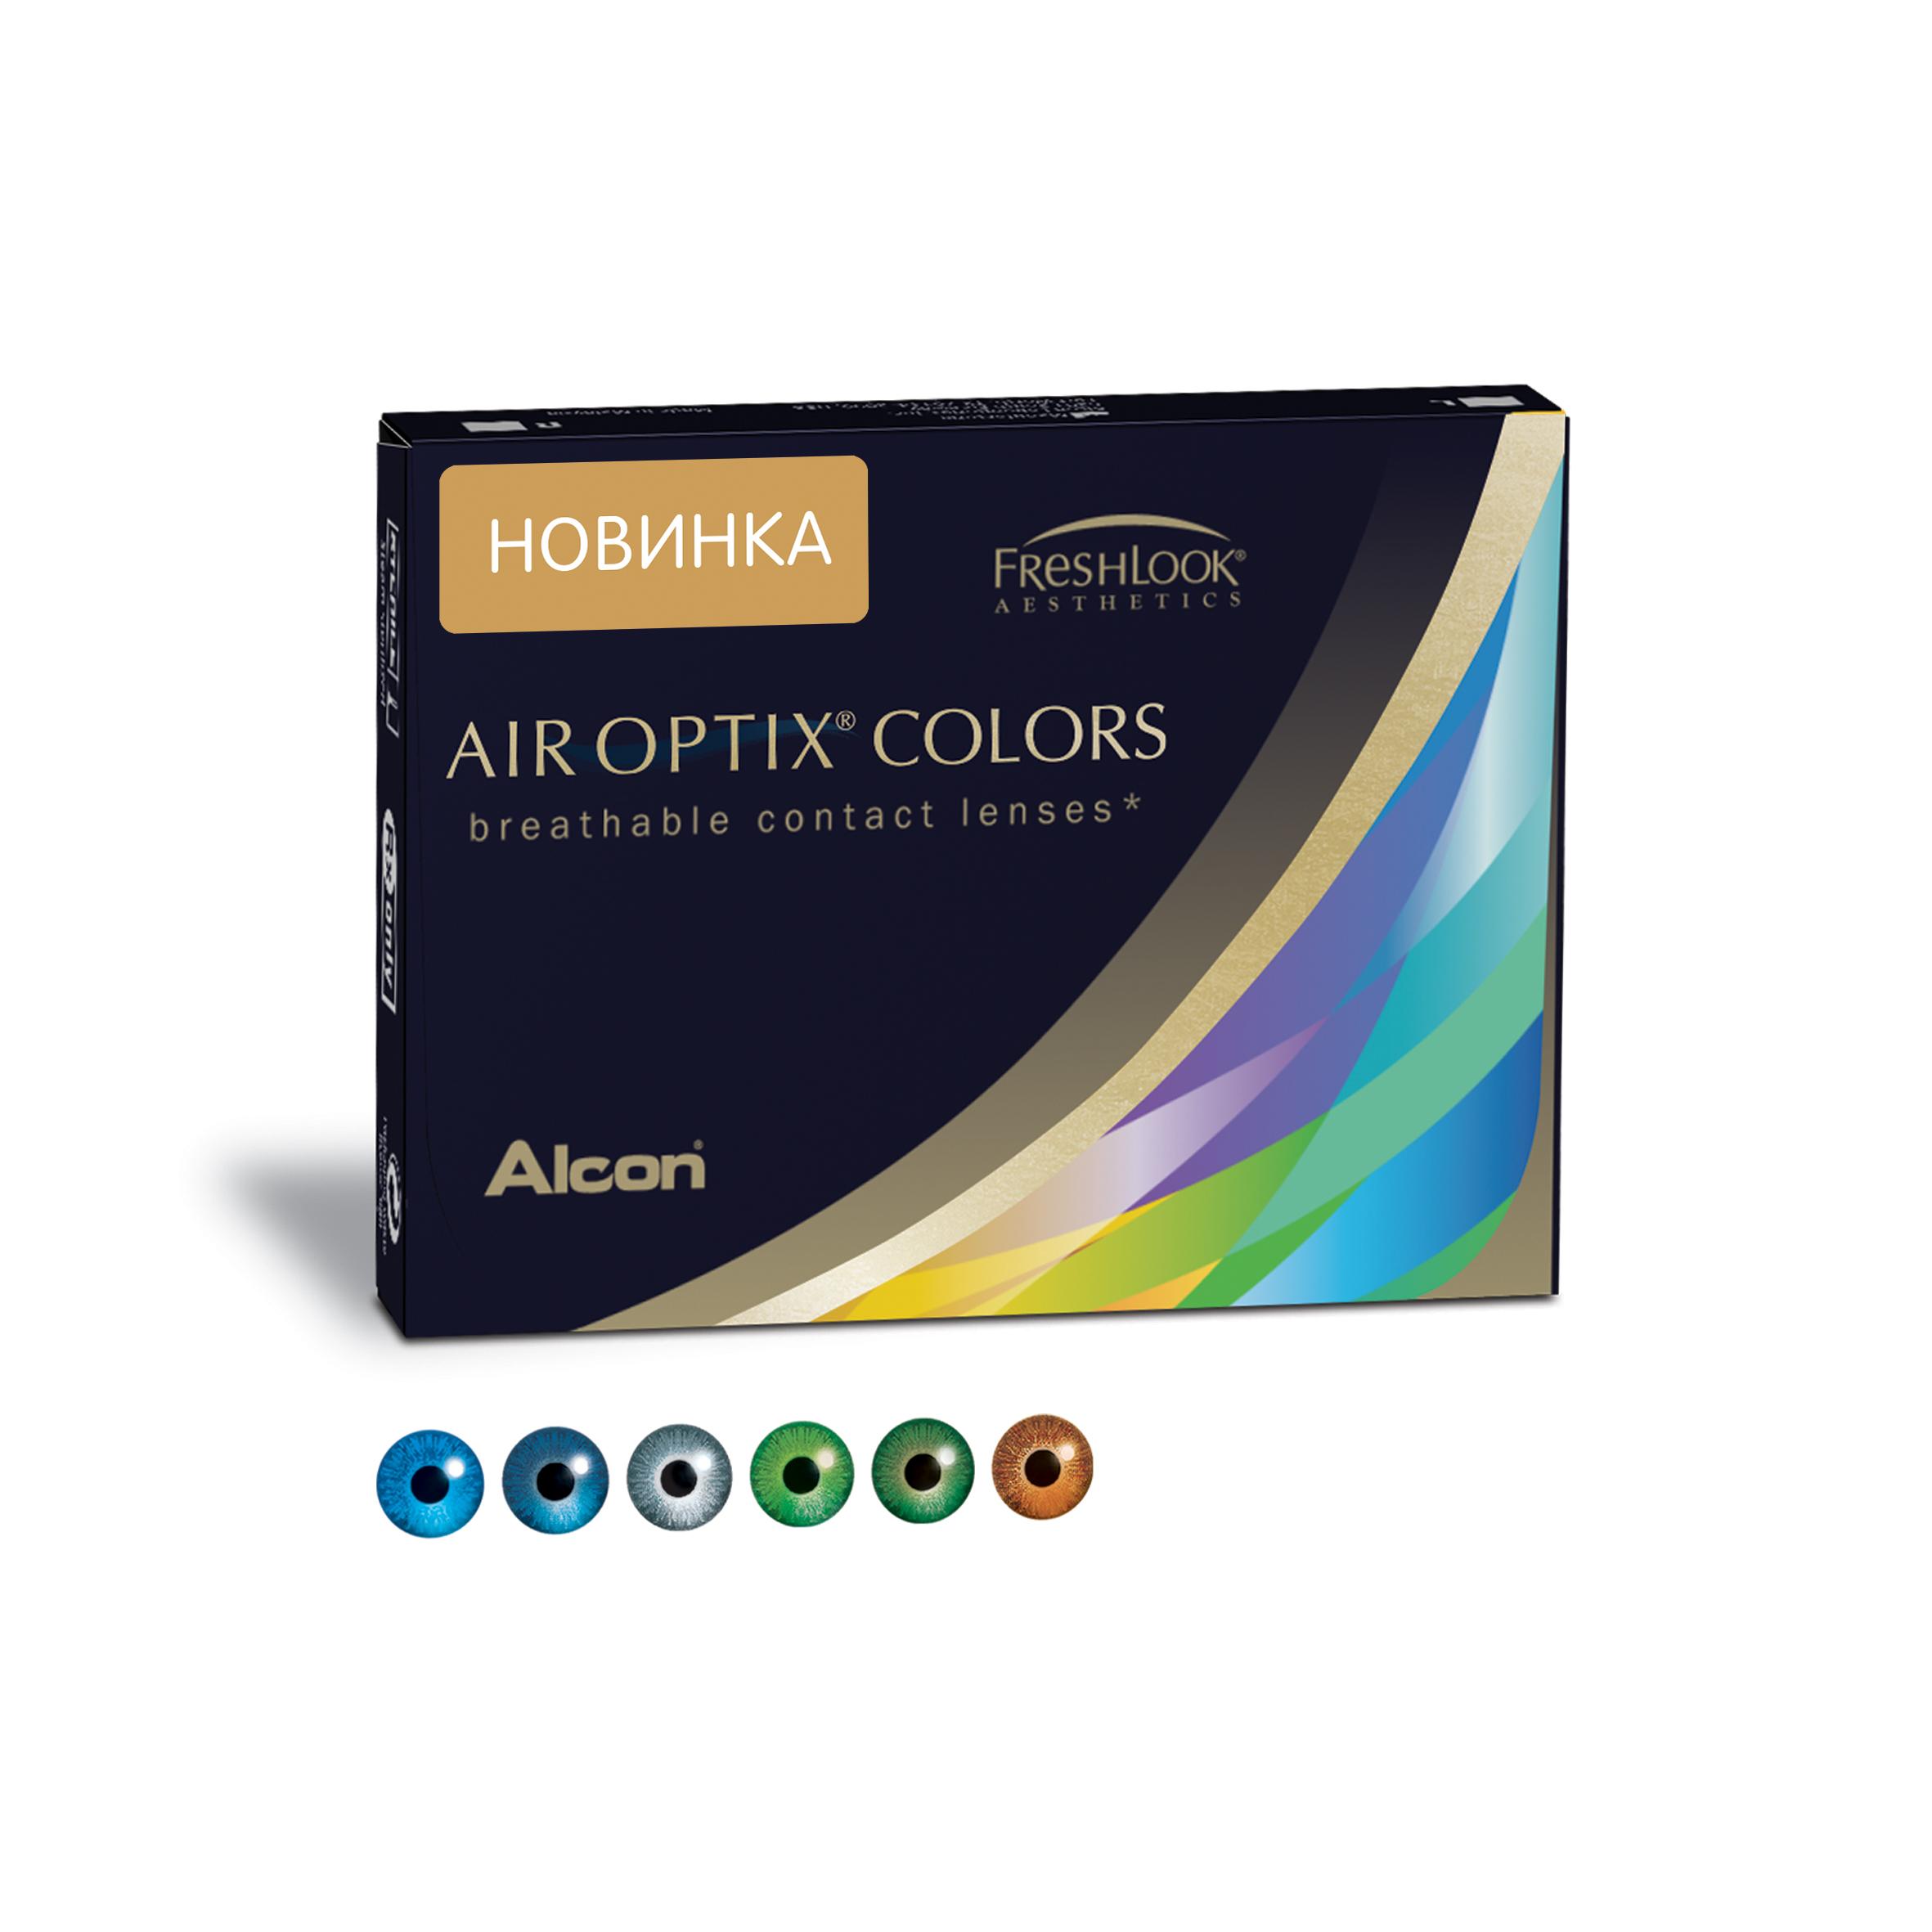 Аlcon контактные линзы Air Optix Colors 2 шт -1.50 Honey31746145Мягкие контактные линзы